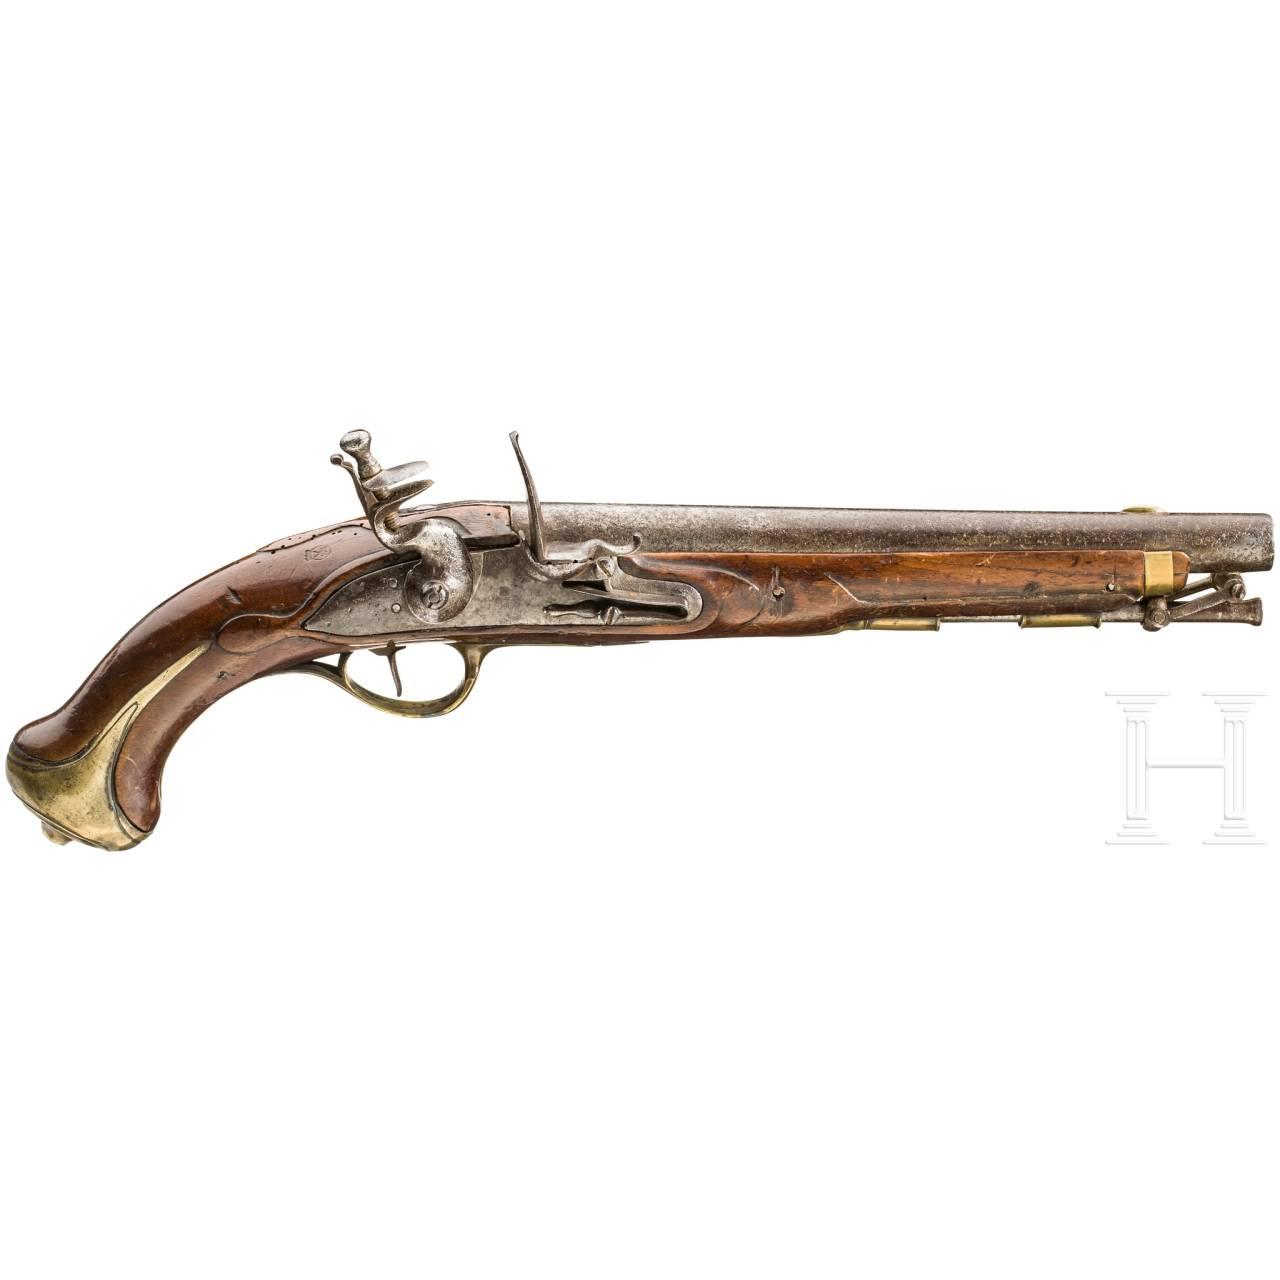 Kavalleriepistole M 1789